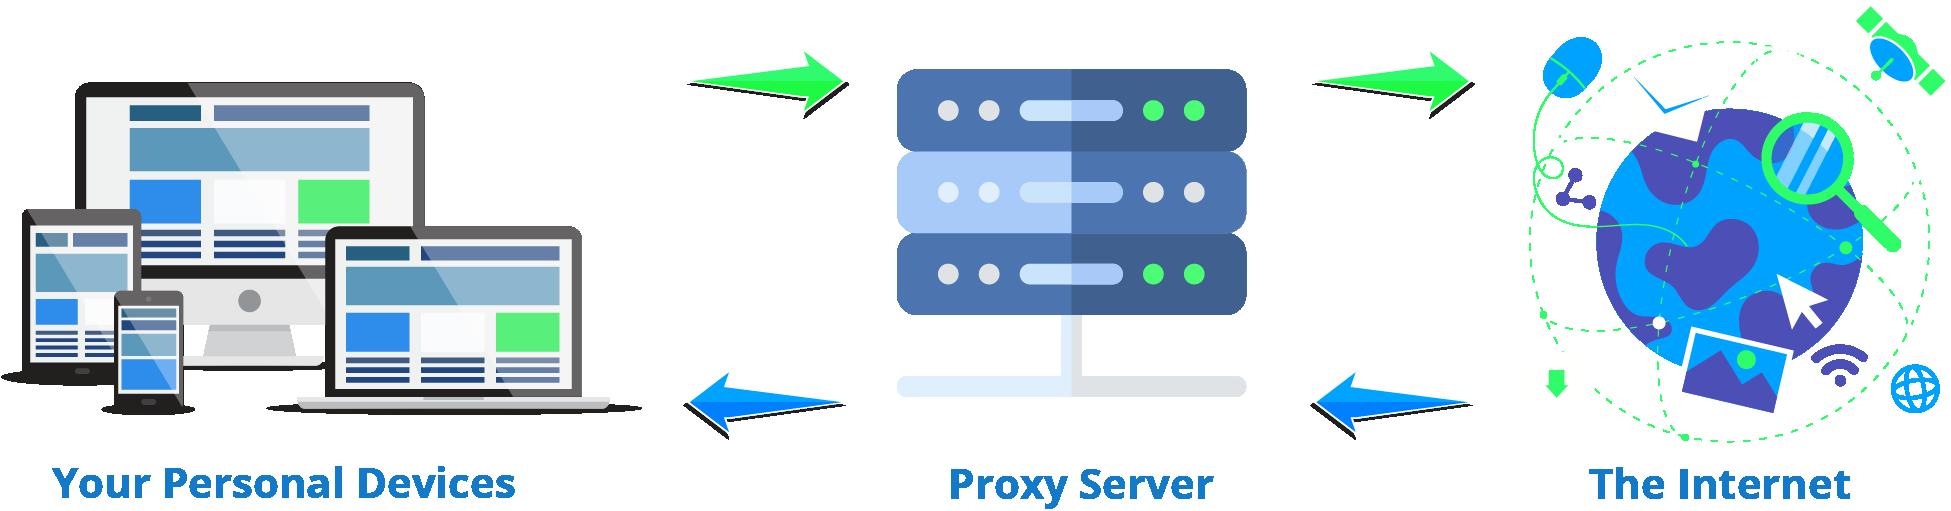 How proxy servers work